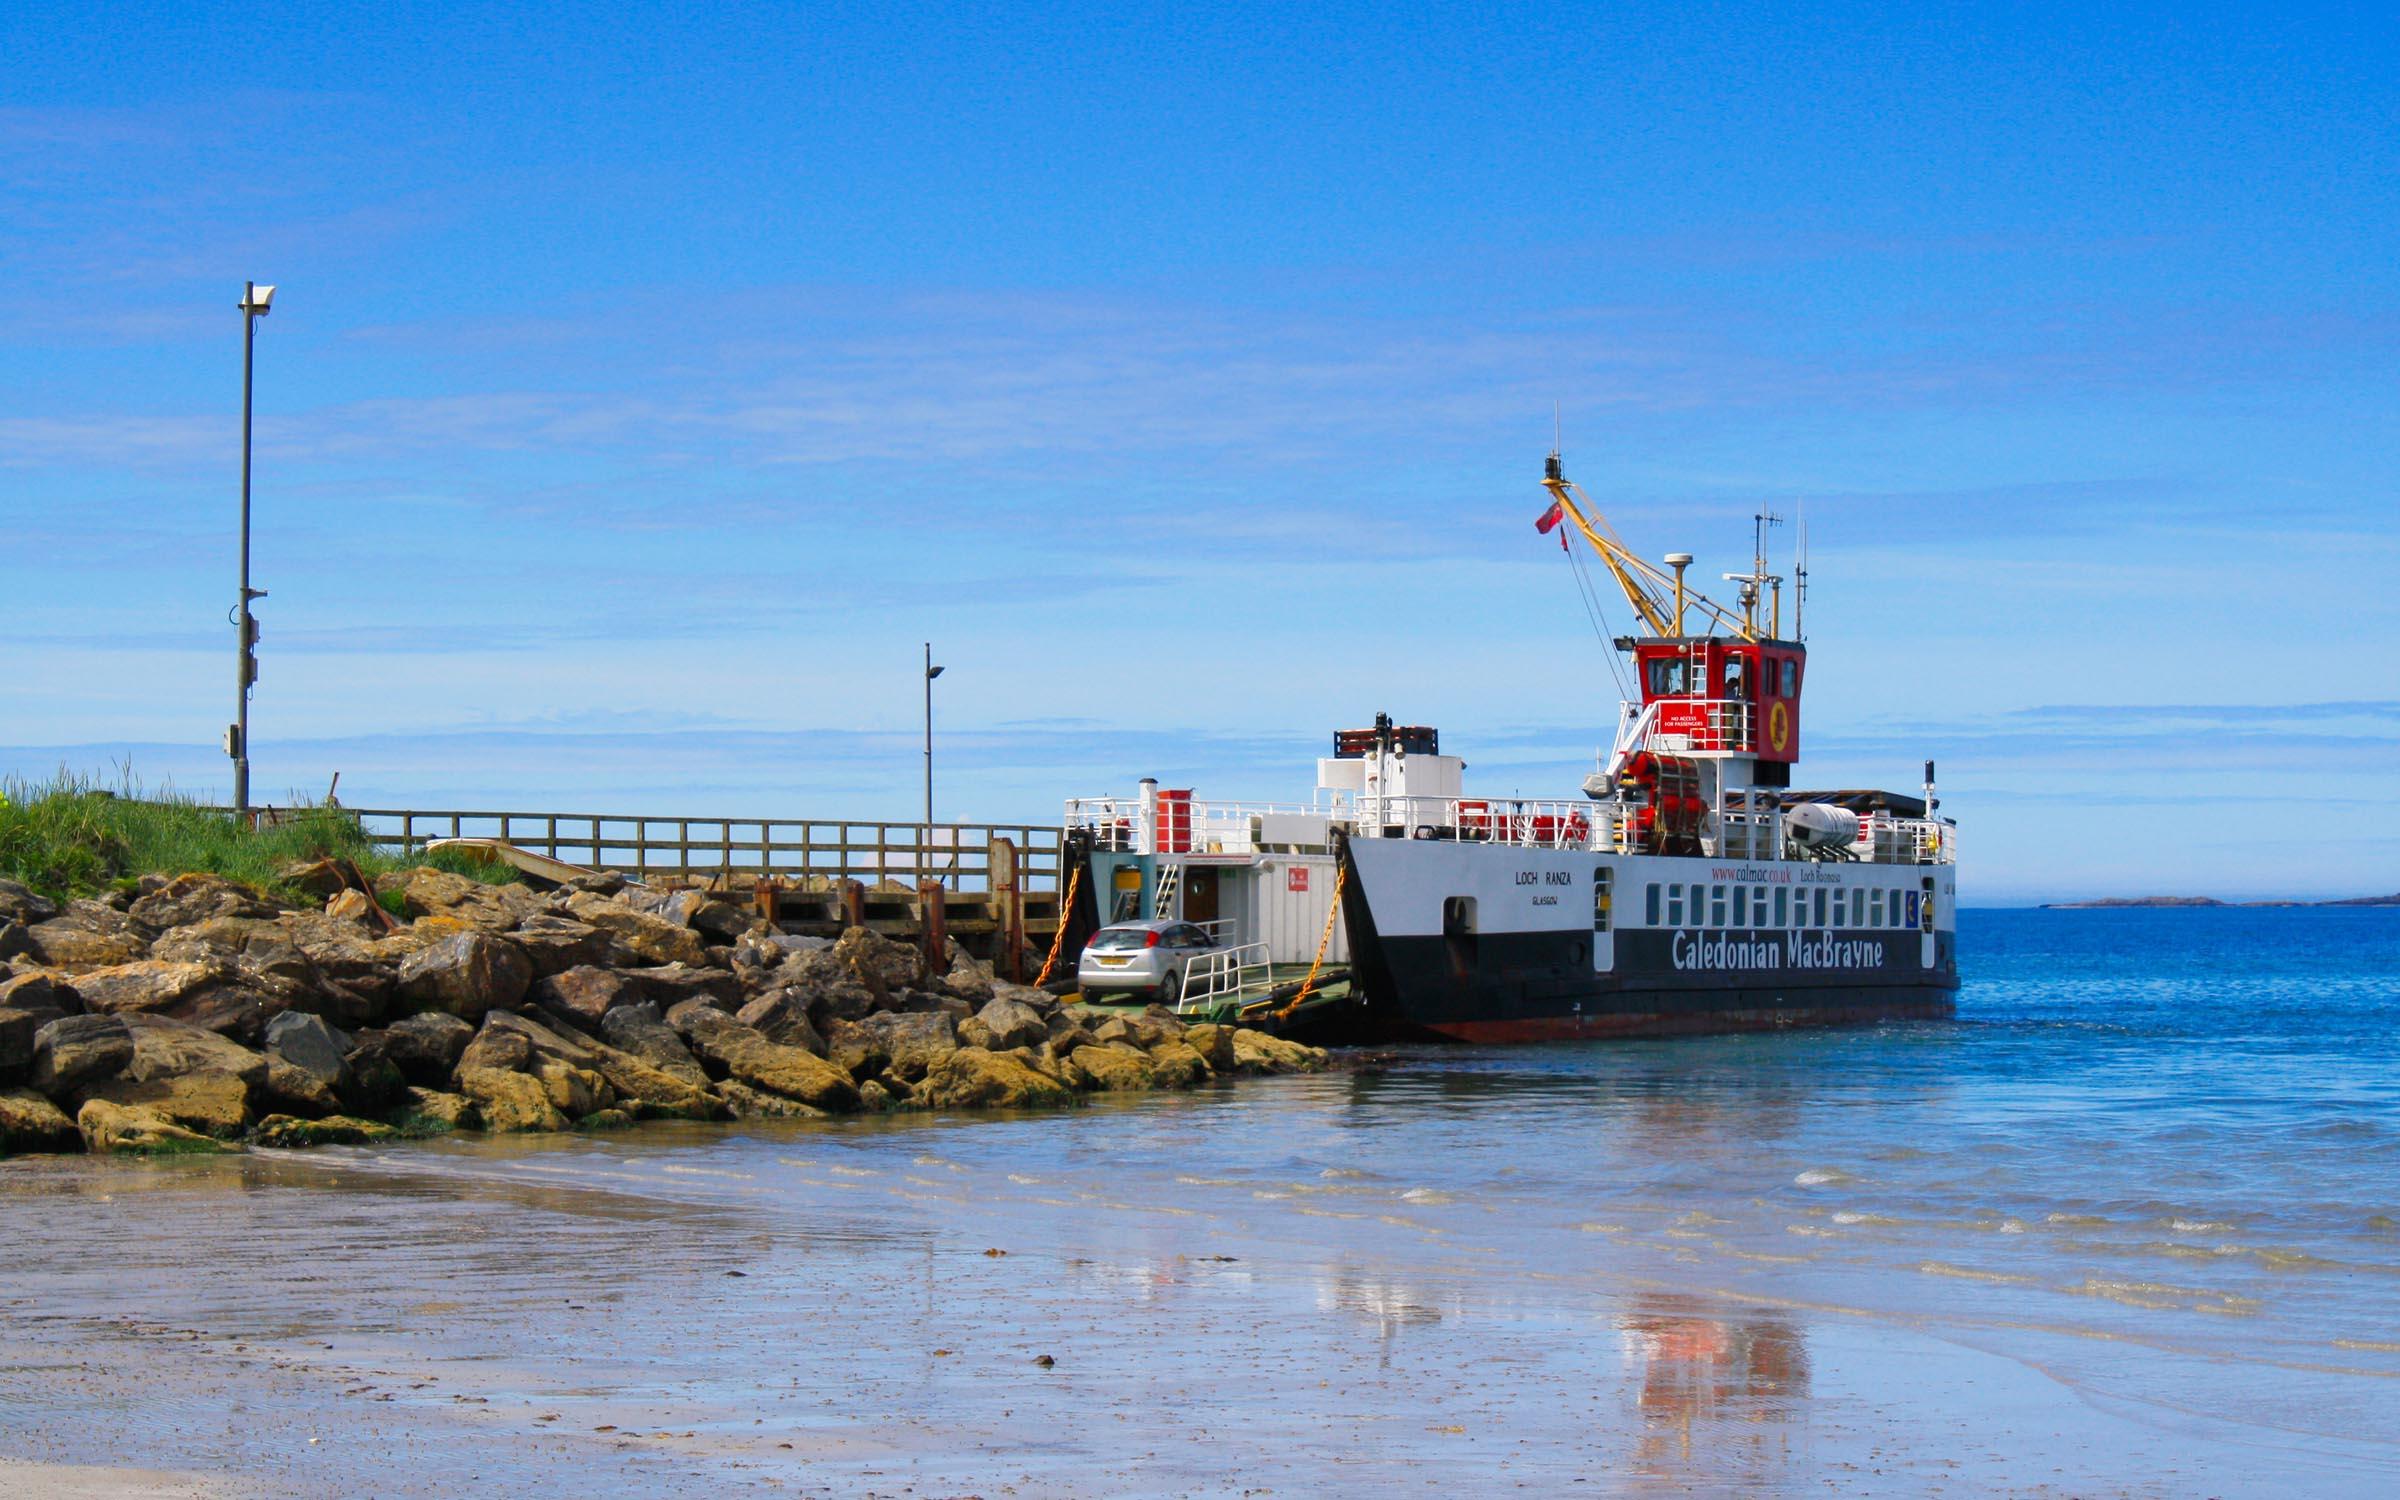 Loch Ranza loading for Gigha (Ships of CalMac)